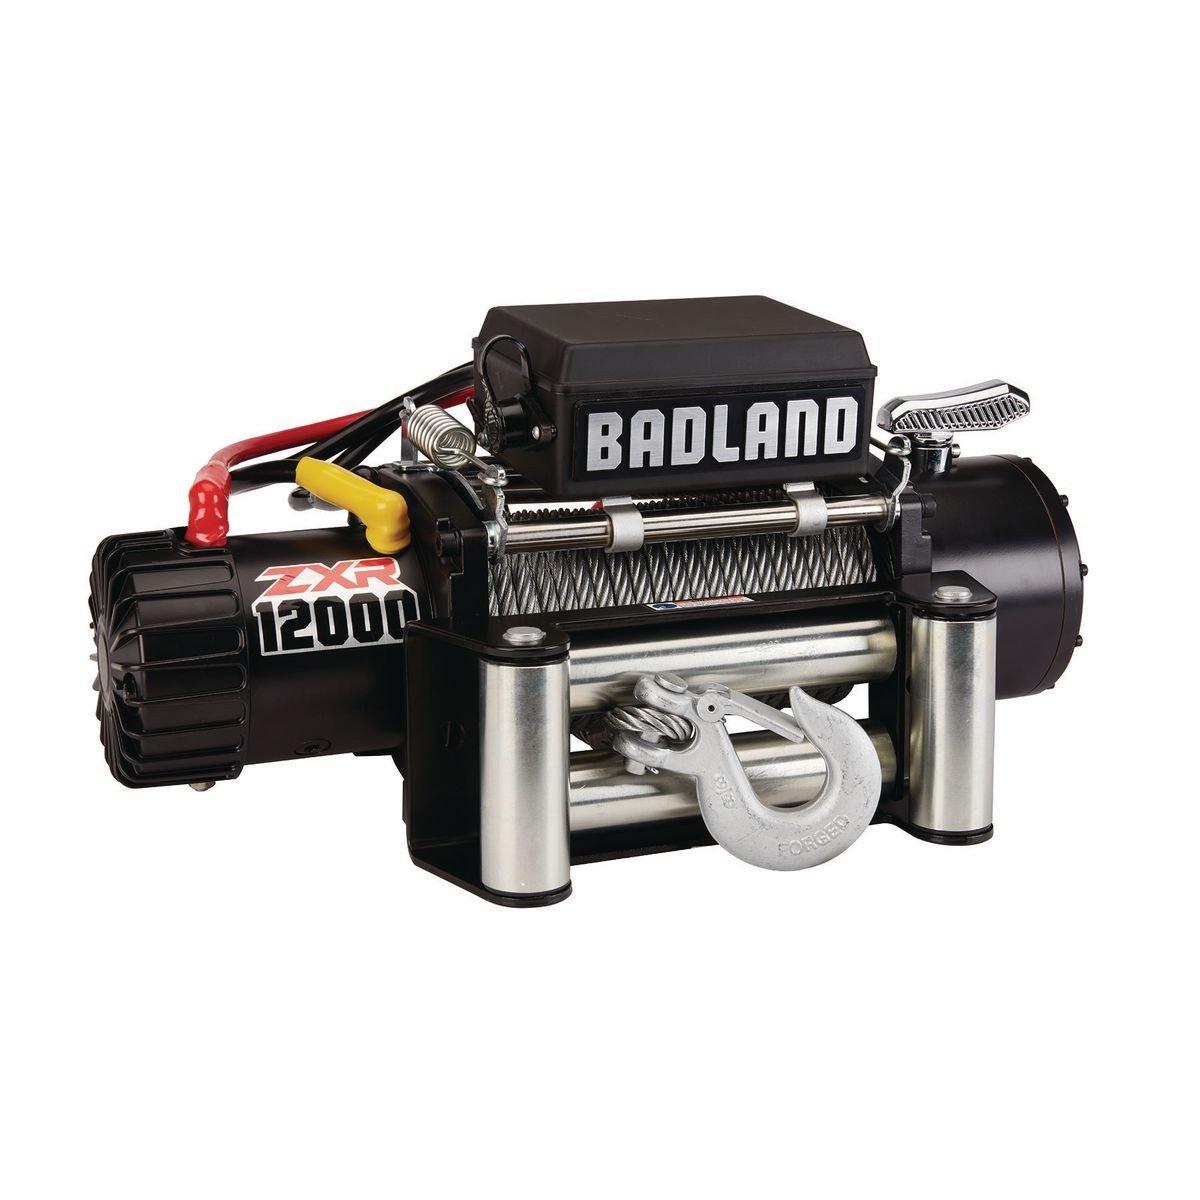 Amazon.com: Badland ZXR 12000 lb. IP 66 Weather Resistant ... on